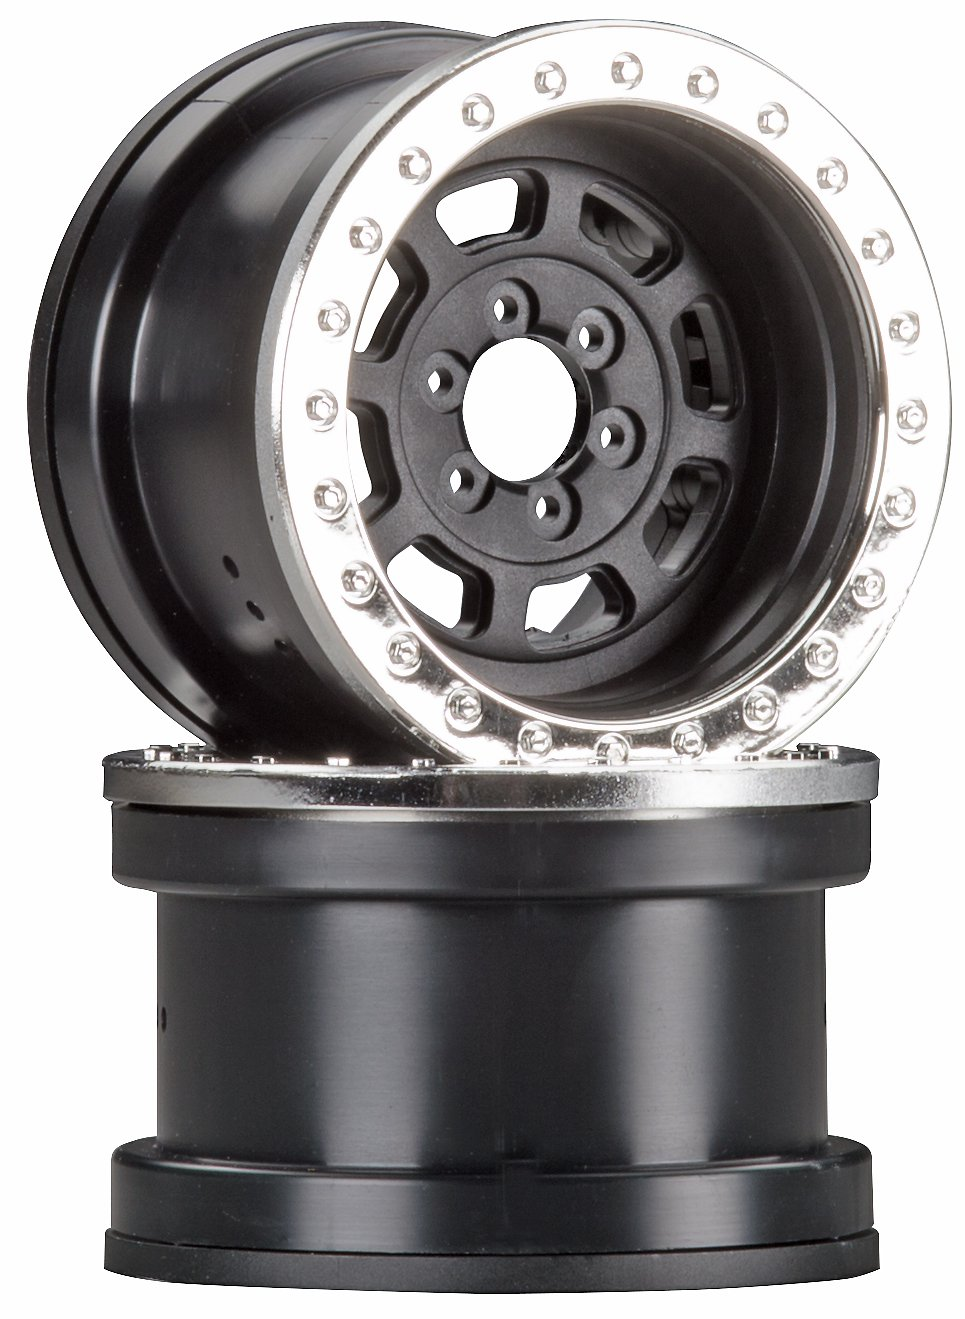 Axial ax08142 2.2 Trail listo HD serie ruedas (Juego de 2), cromado